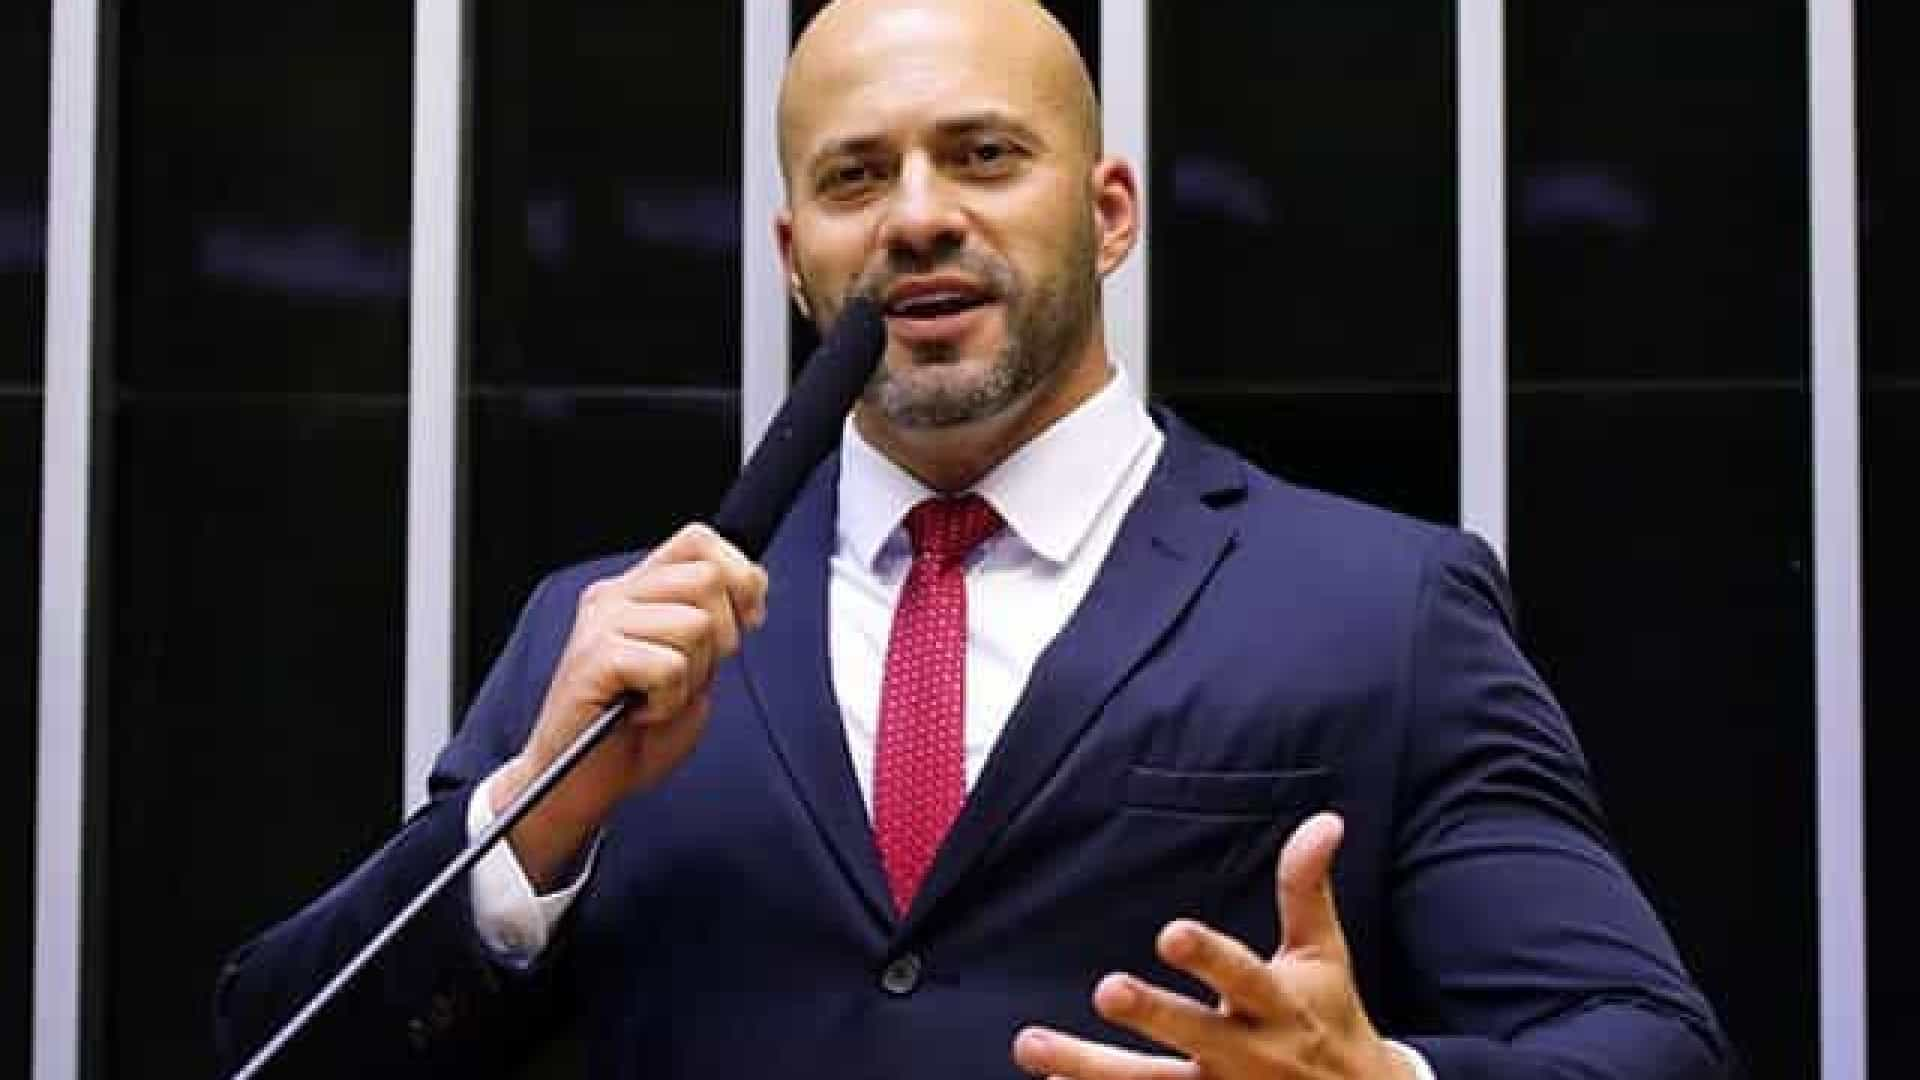 Ministro do STF autoriza prisão domiciliar para deputado Daniel Silveira